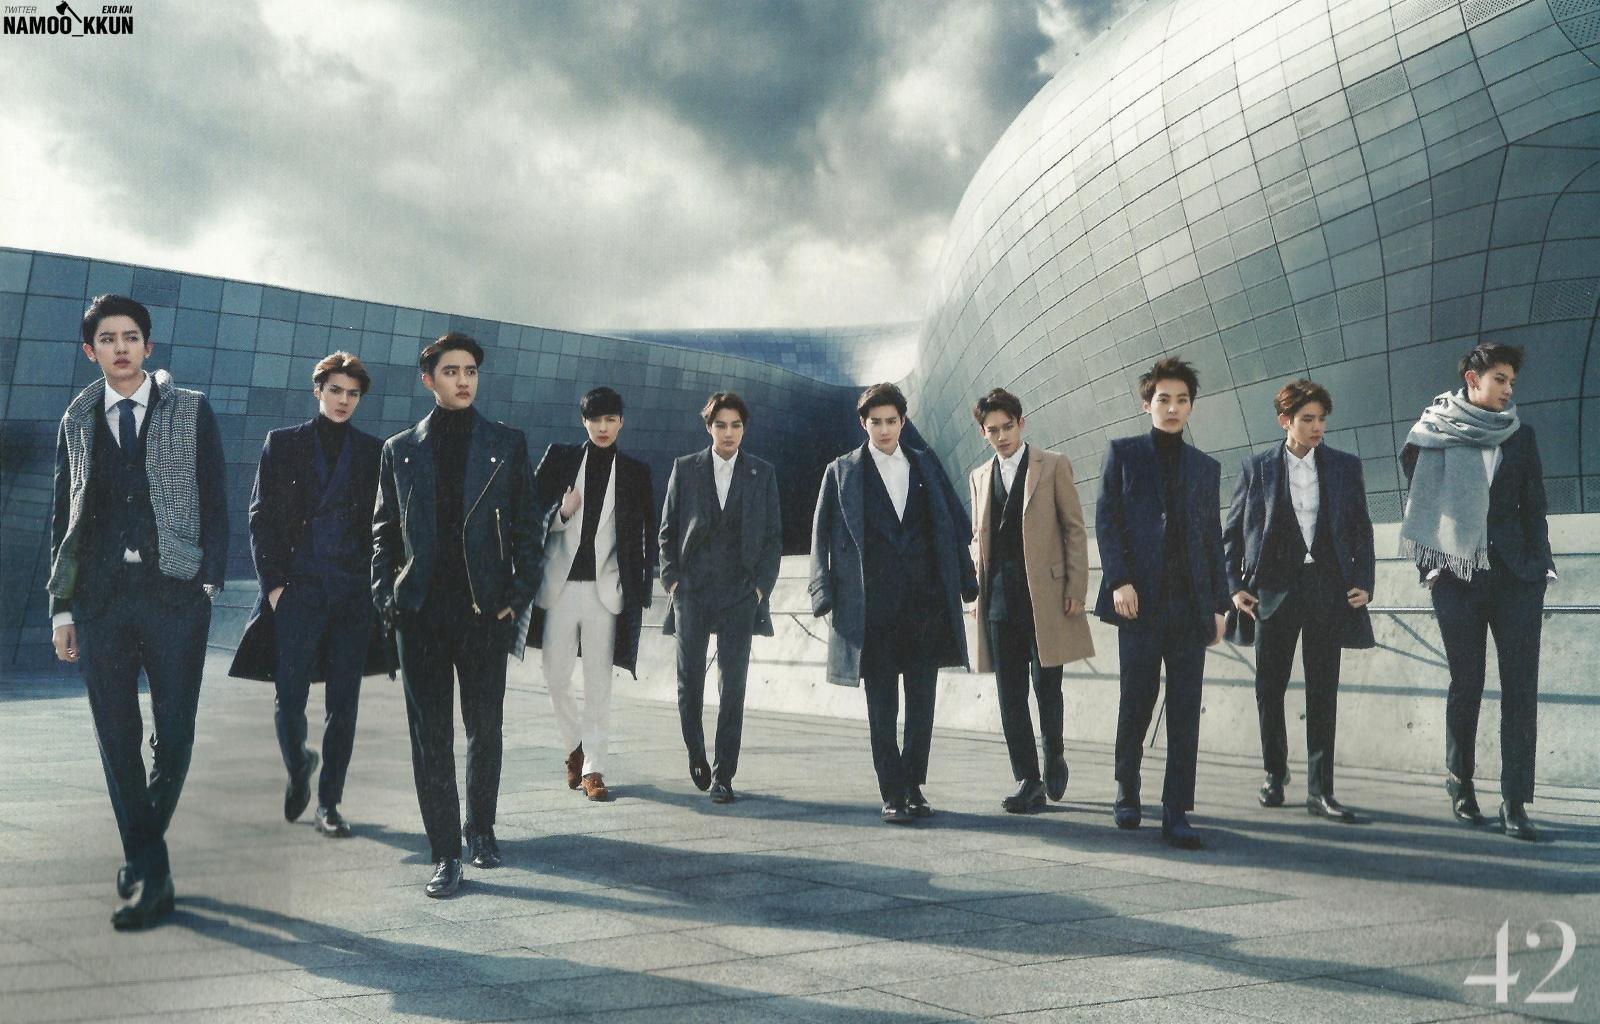 Exo The Celebrity Magazine 82519 Hd Wallpaper